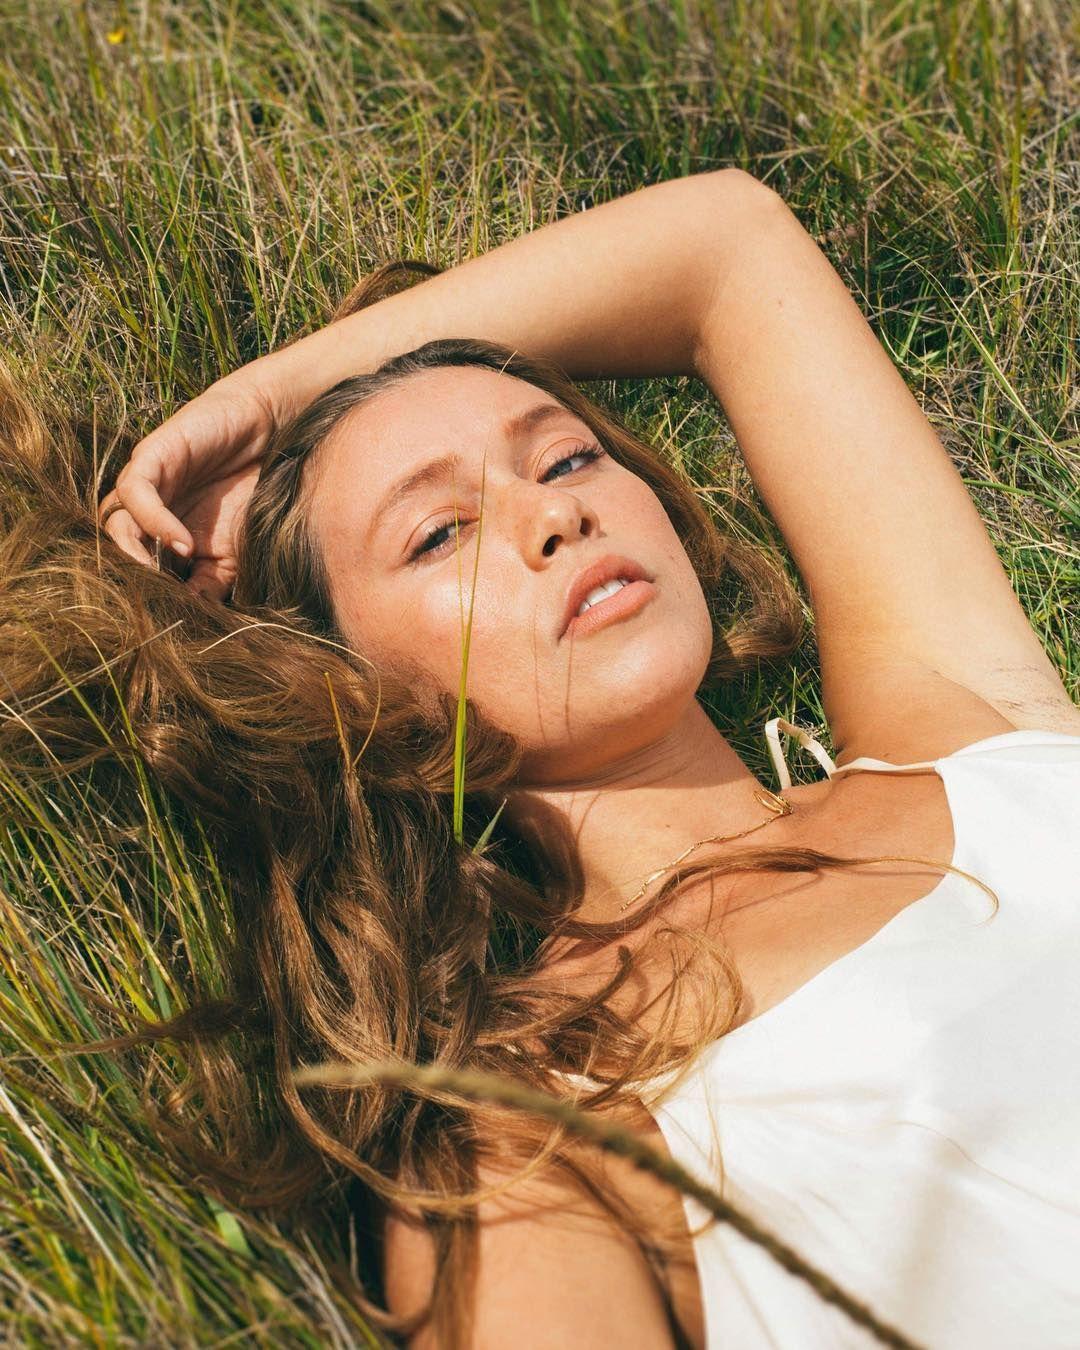 Drove to the foothills of  Mauna Kea with this beauty 🌿 #luckywelivehawaii #ragehawaii #doitfortheprocess #aloha #bigislandbusiness #lightlovers #agameoftones #aloha🌺 #fluxhawaii #creaturecommune #justgoshoot #shotwithlove #bigislandphotographer #bleachmyfilm #waverunner #bigislandhawaii #bigislandmodel #hawaiifive0 #quietthechaos #portraitmag #localhawaii #loveandwildhearts #postthepeople #ilivealoha🌸 #hawaiiengagement #lovegold #hawaiiproposal #oceanside #xposuremag #konaphotographer